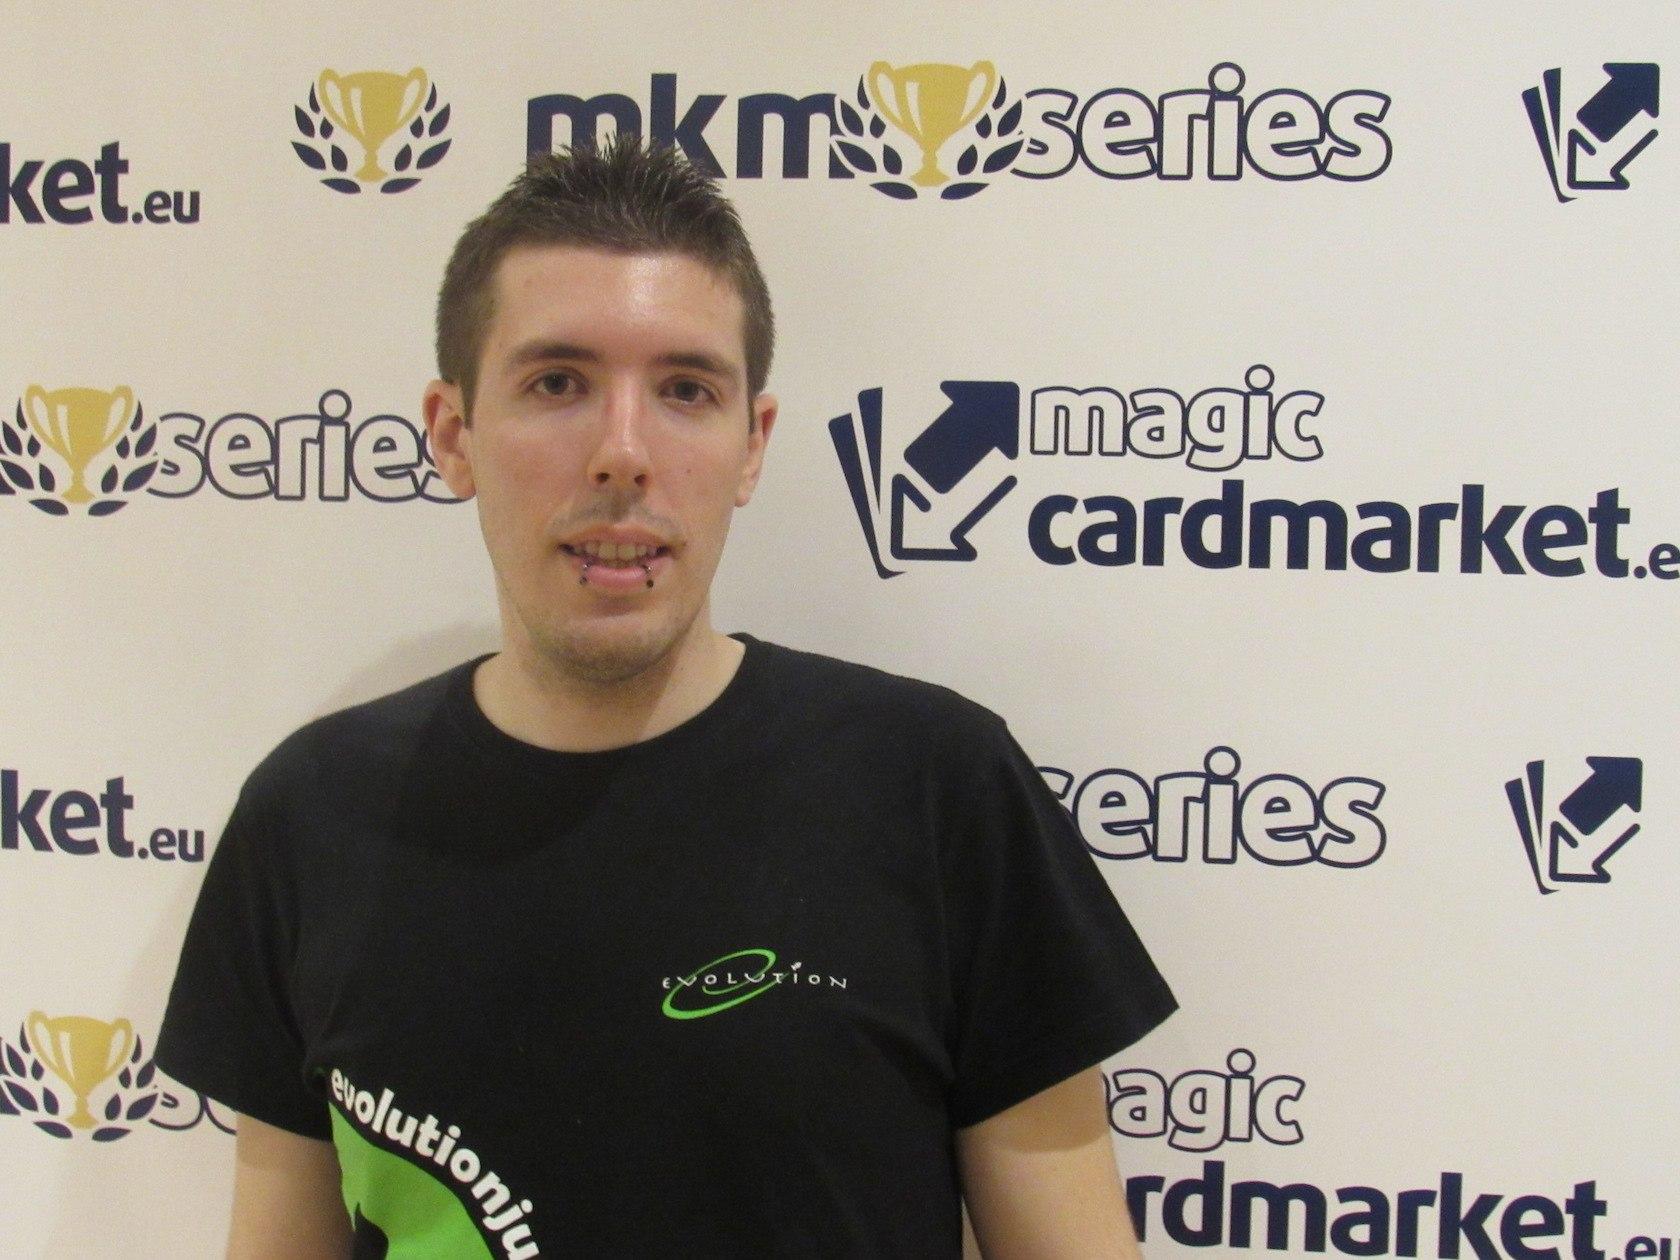 Rodrigo Togores won a number of MKM Series events